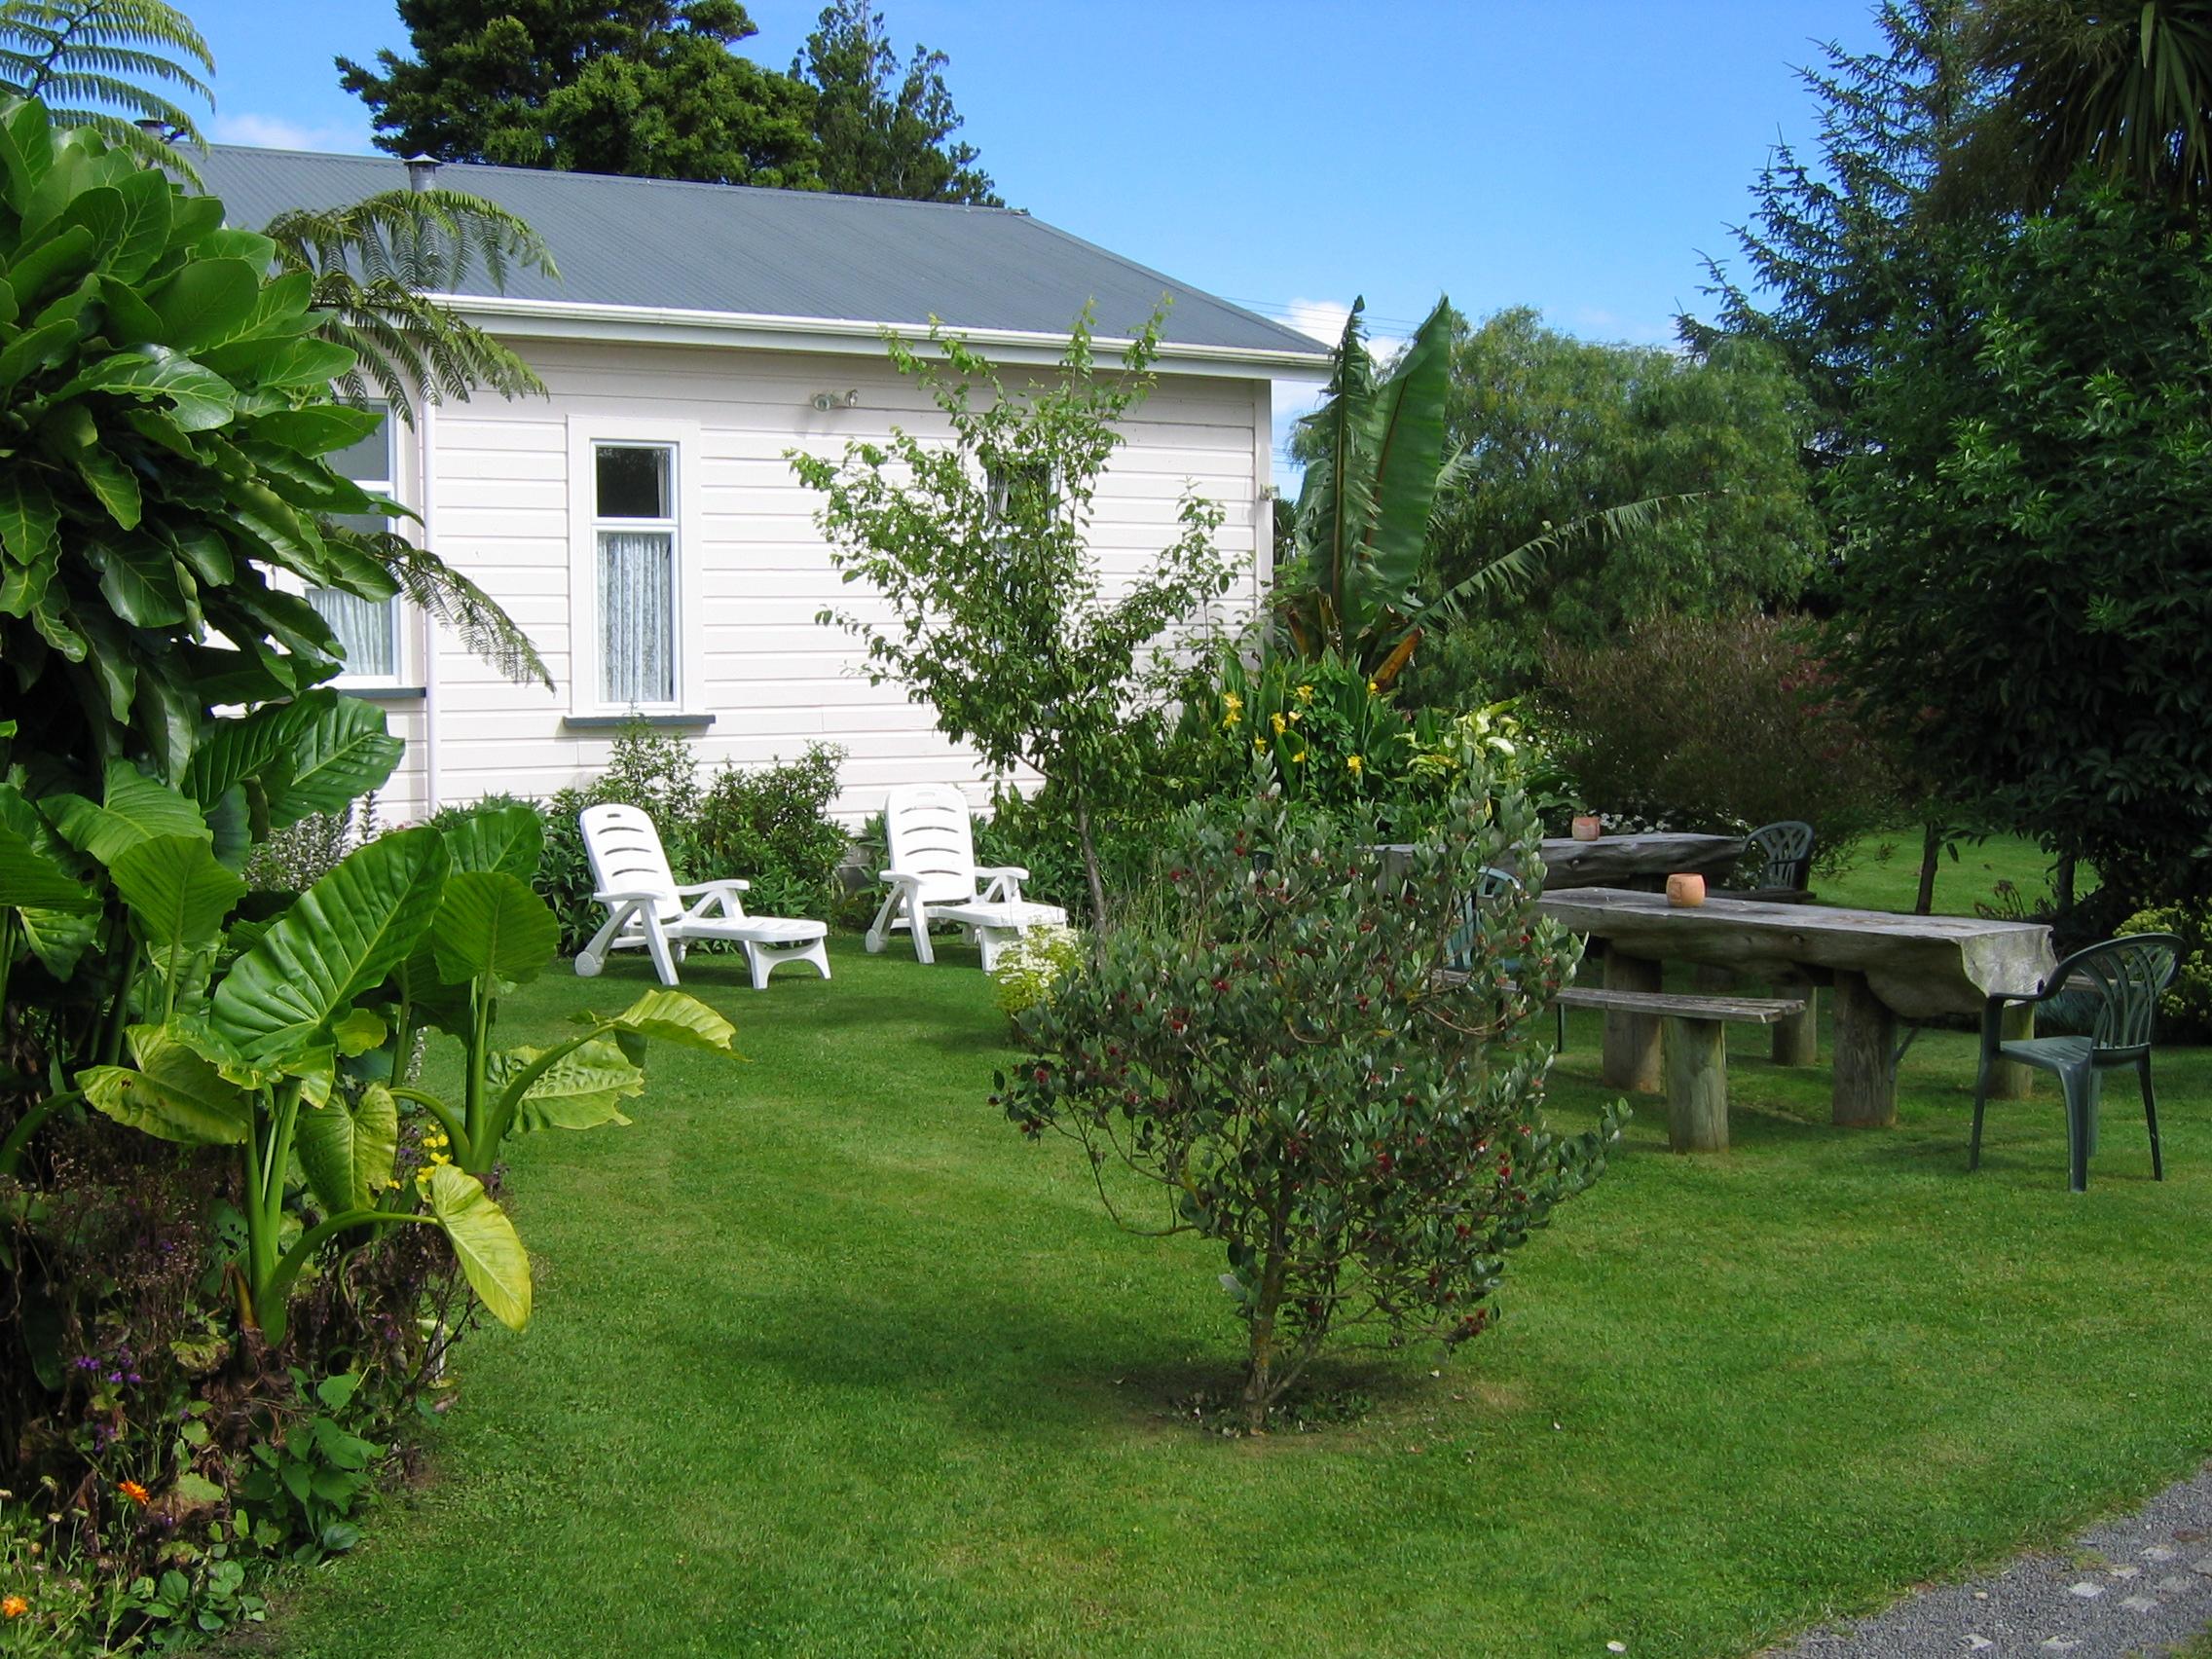 Sun loungers in gardens